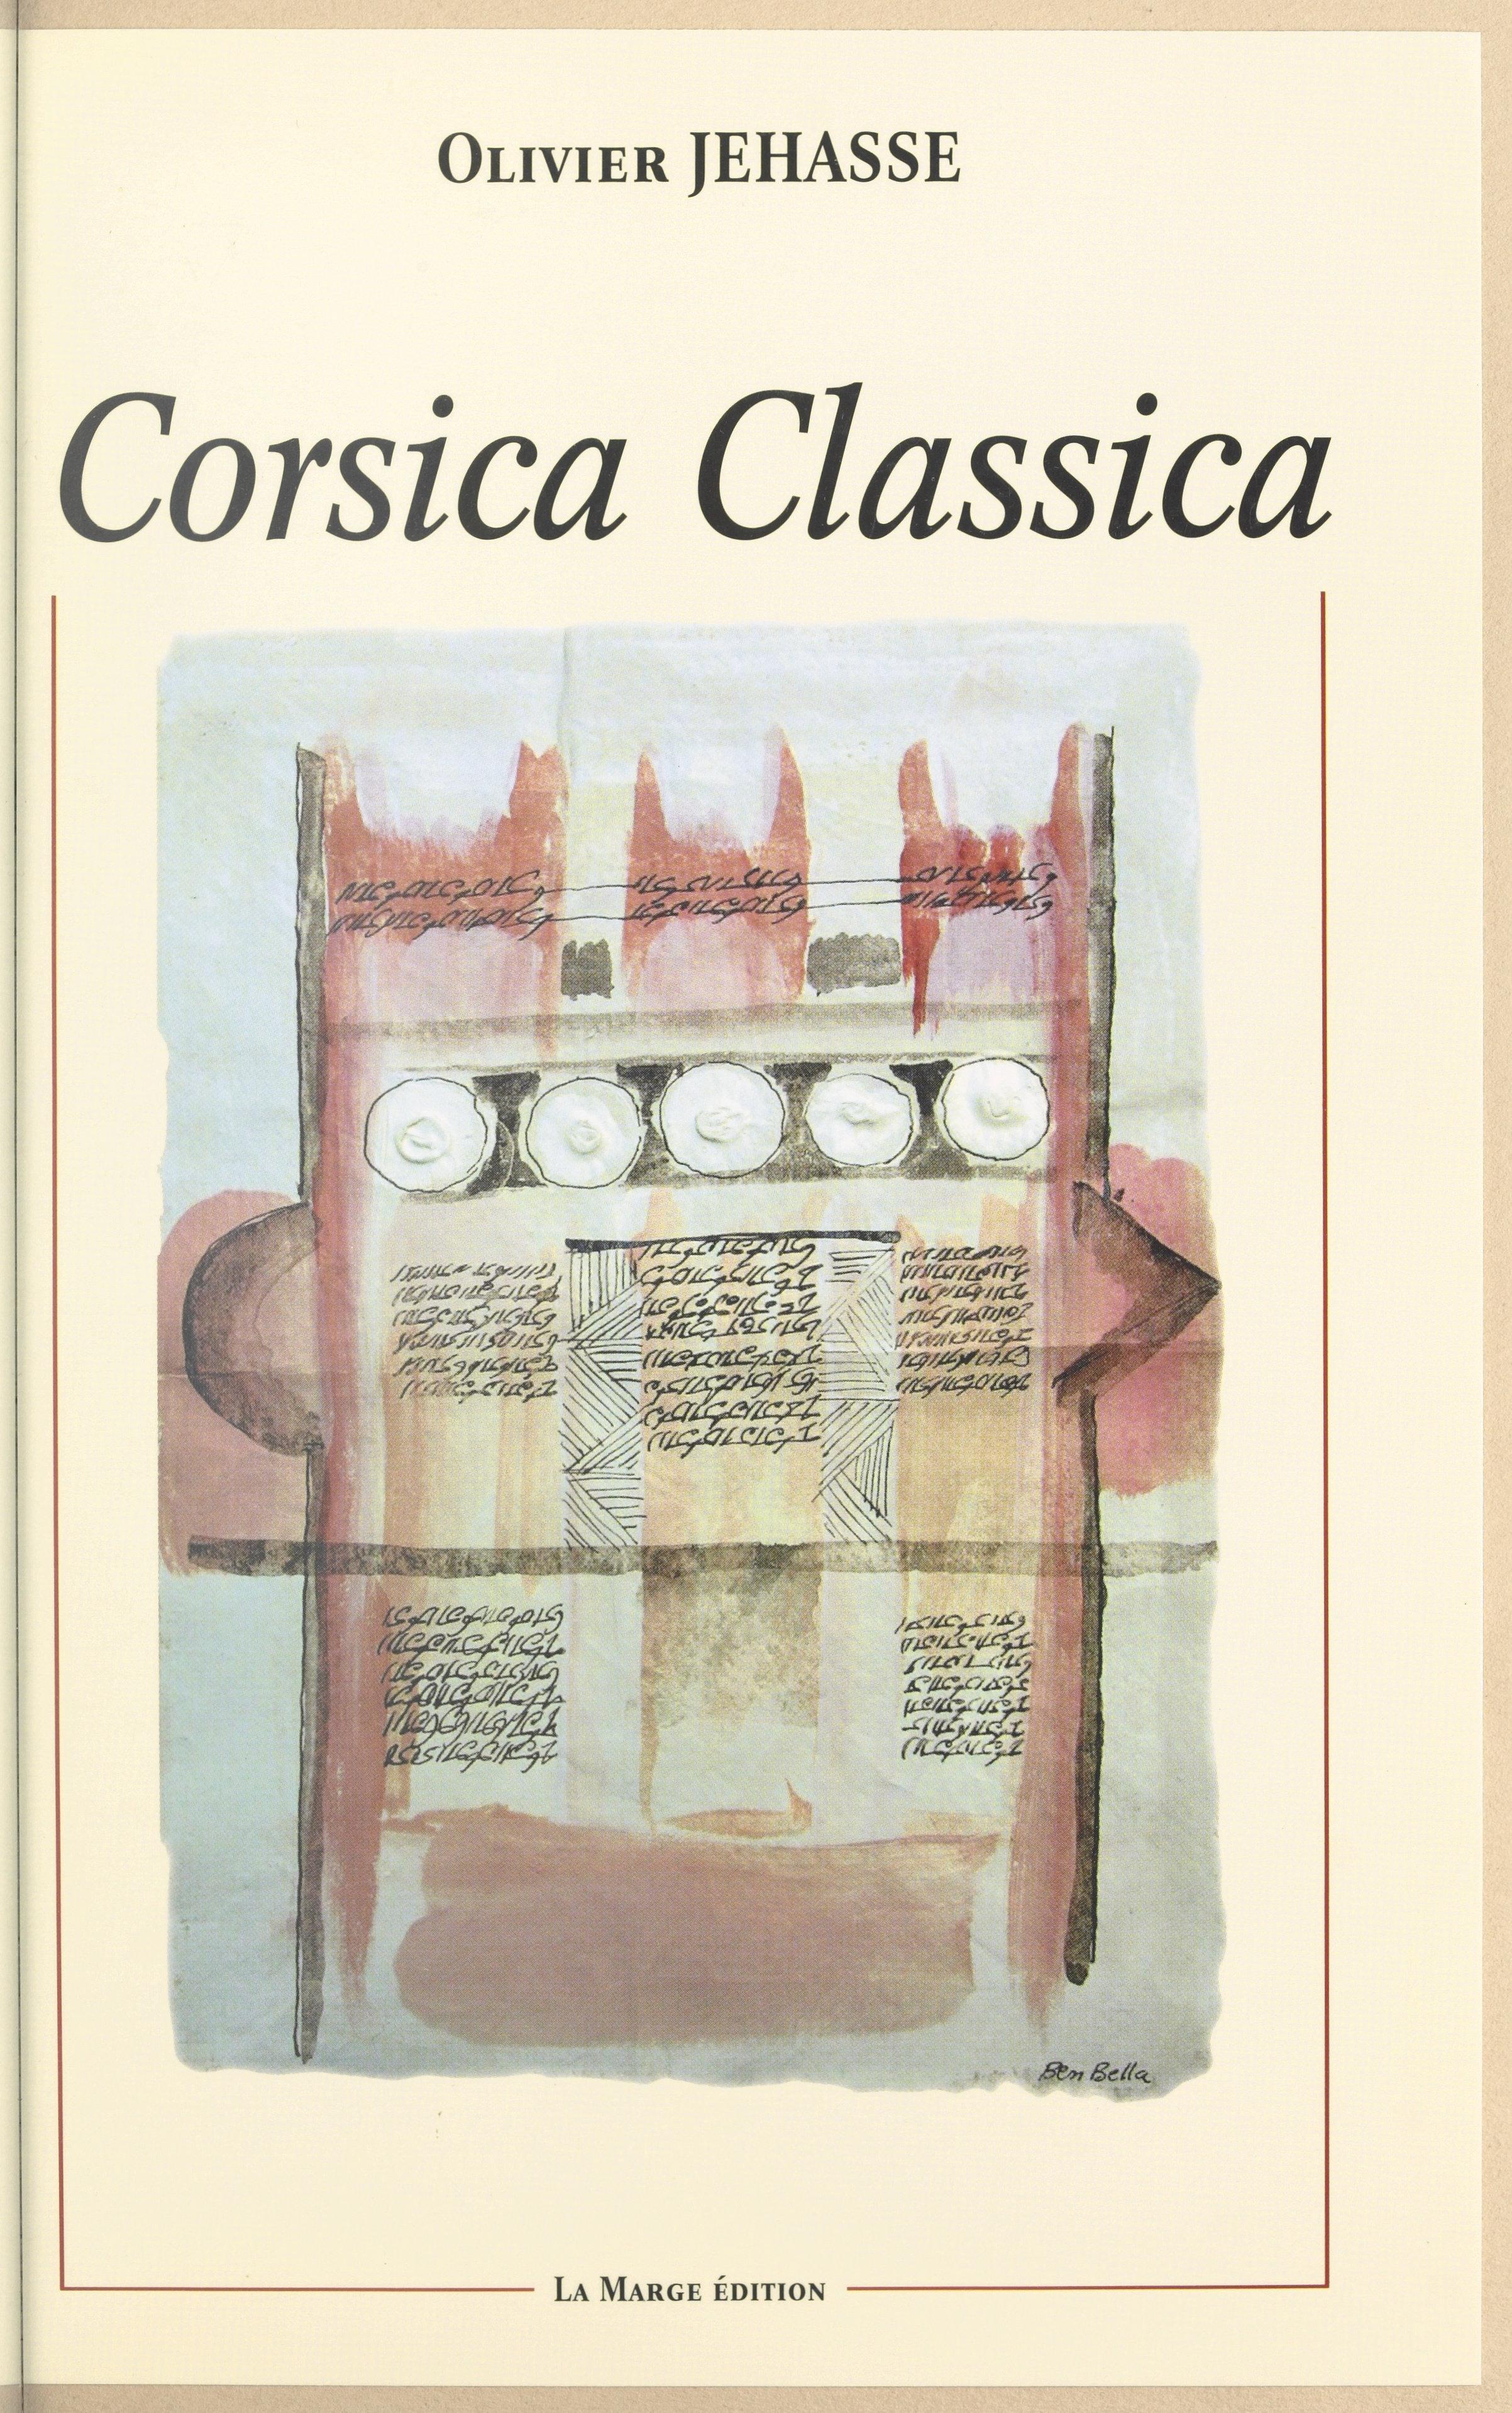 Corsica classica